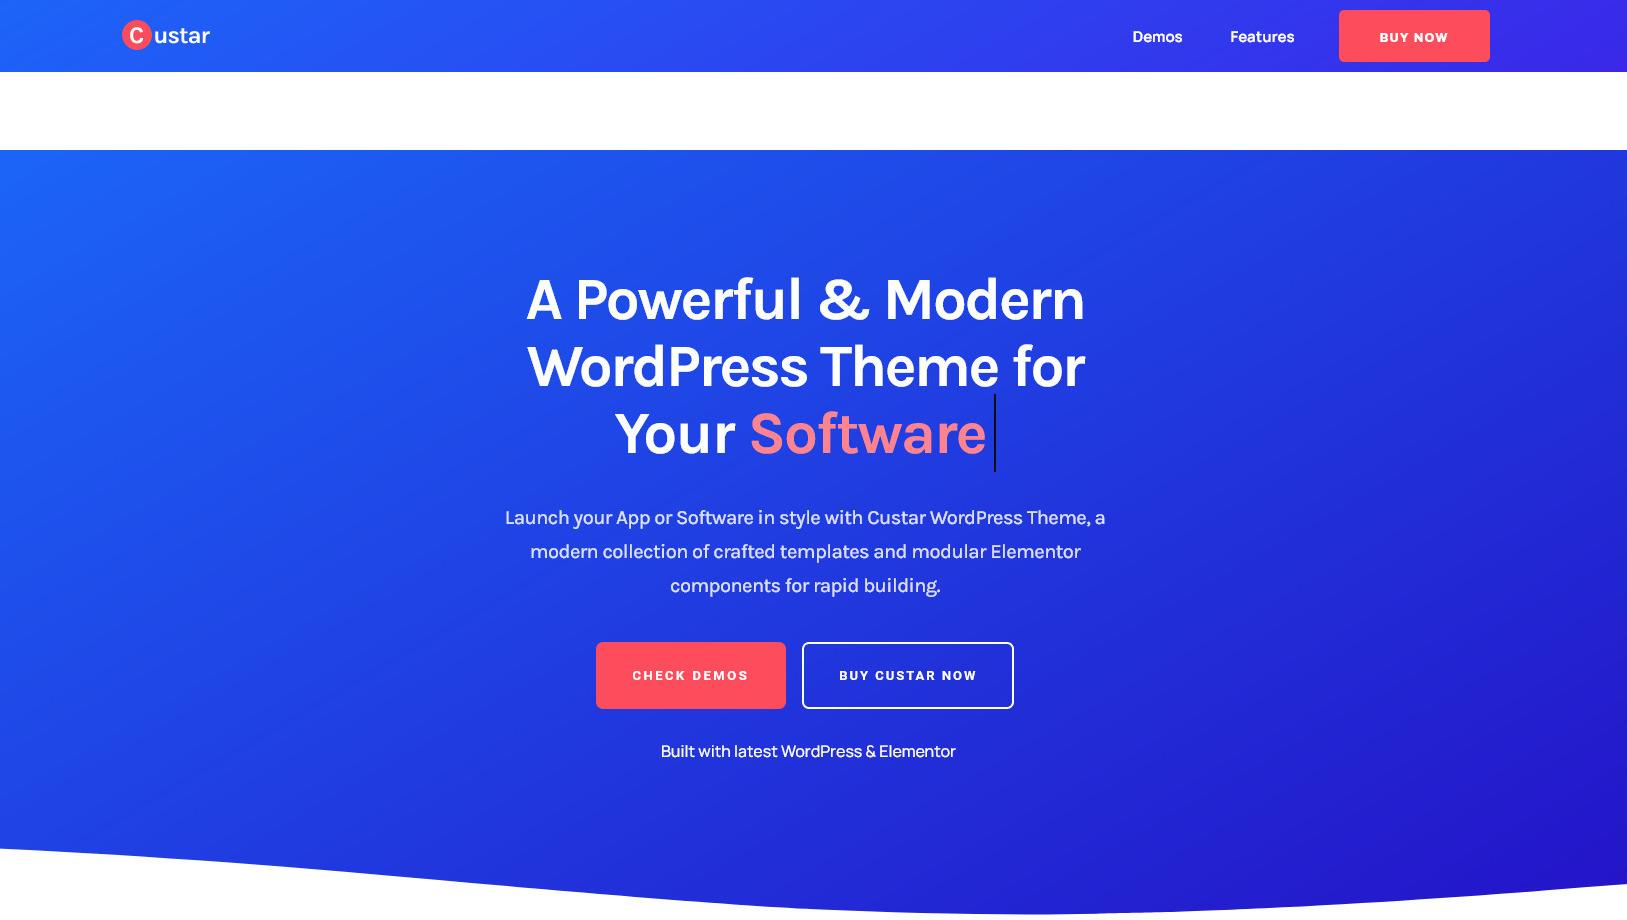 Custar FinestDevs Applications and App Lander WordPress Theme